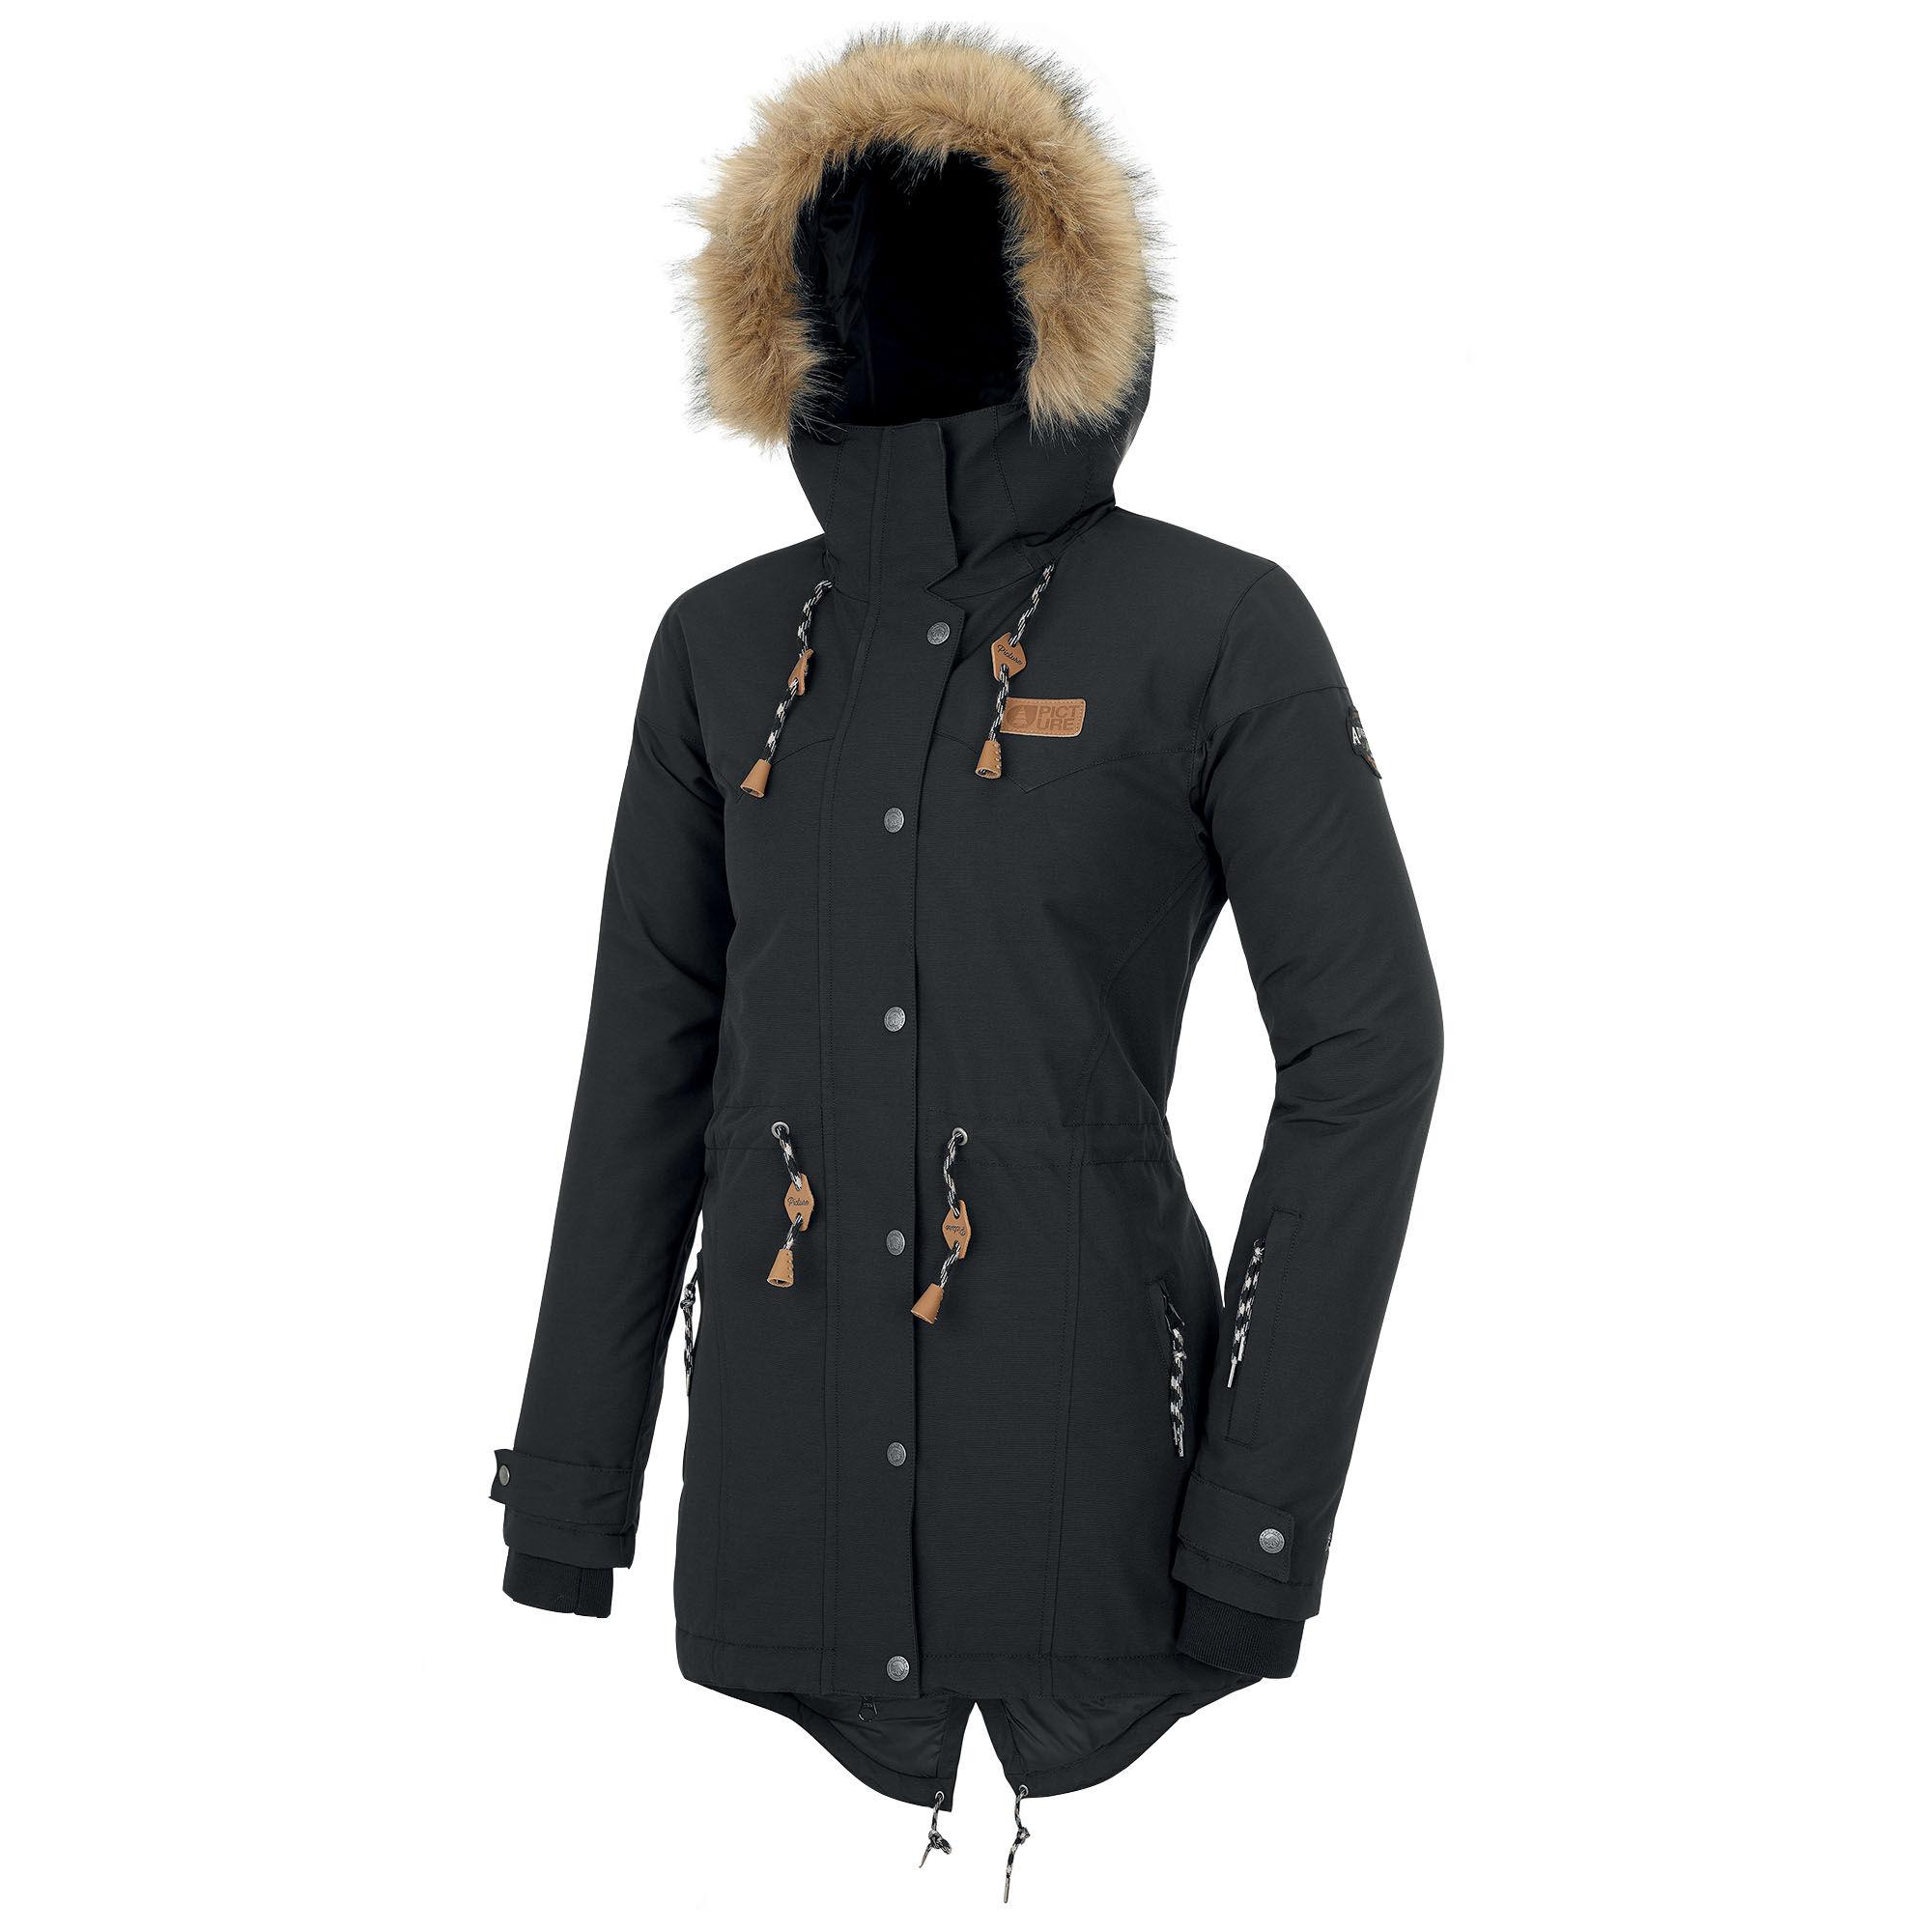 Picture Organic Clothing Women's Katniss Snow Jacket  - Black - Size: Large